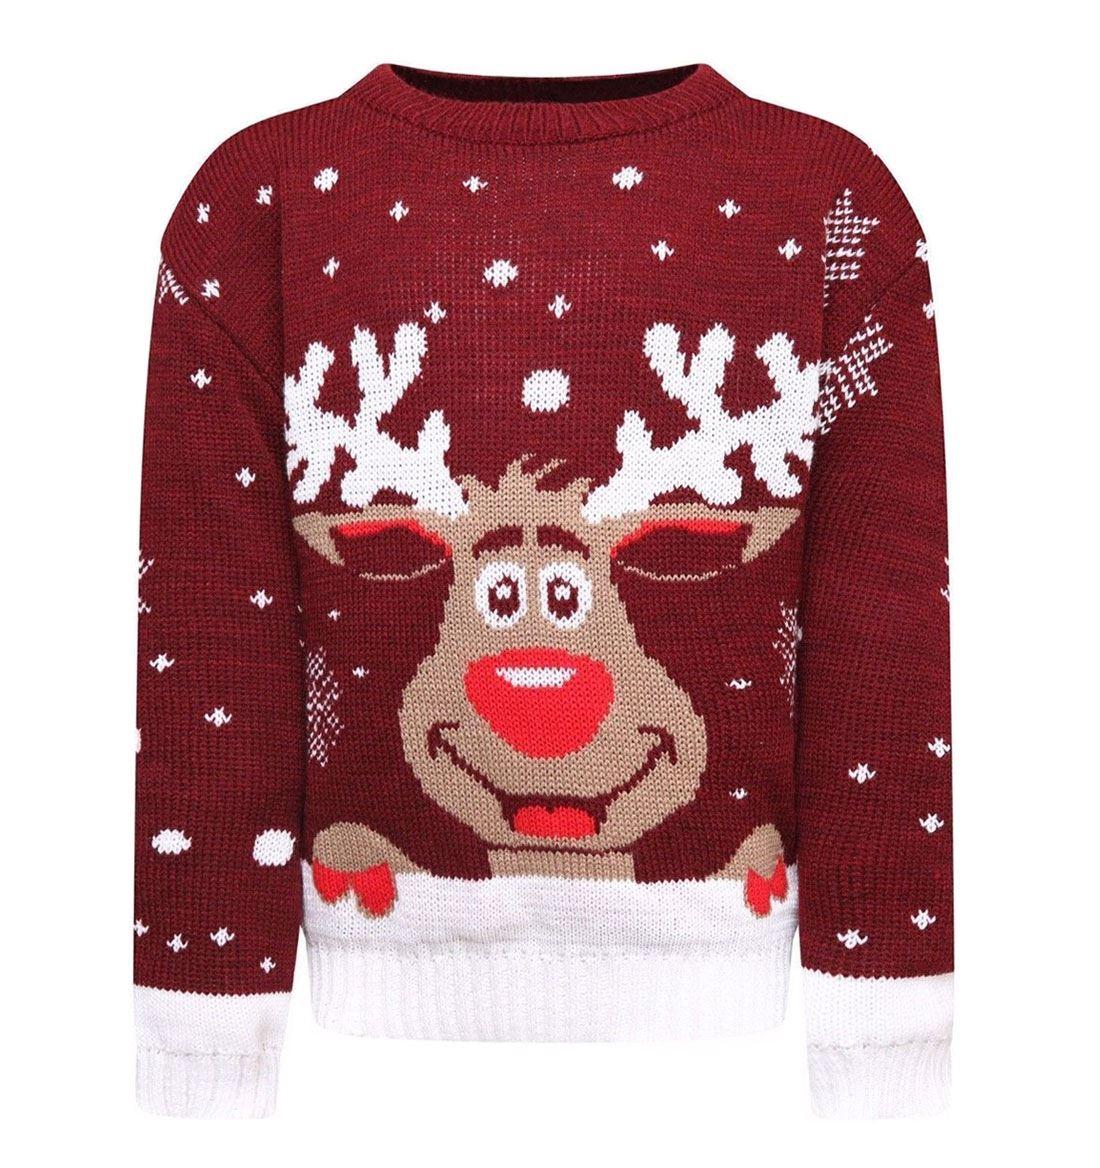 Womens-Long-Sleeve-Snowflake-Knitted-Christmas-Jumper-Kids-Unisex-Winter-Sweater thumbnail 5